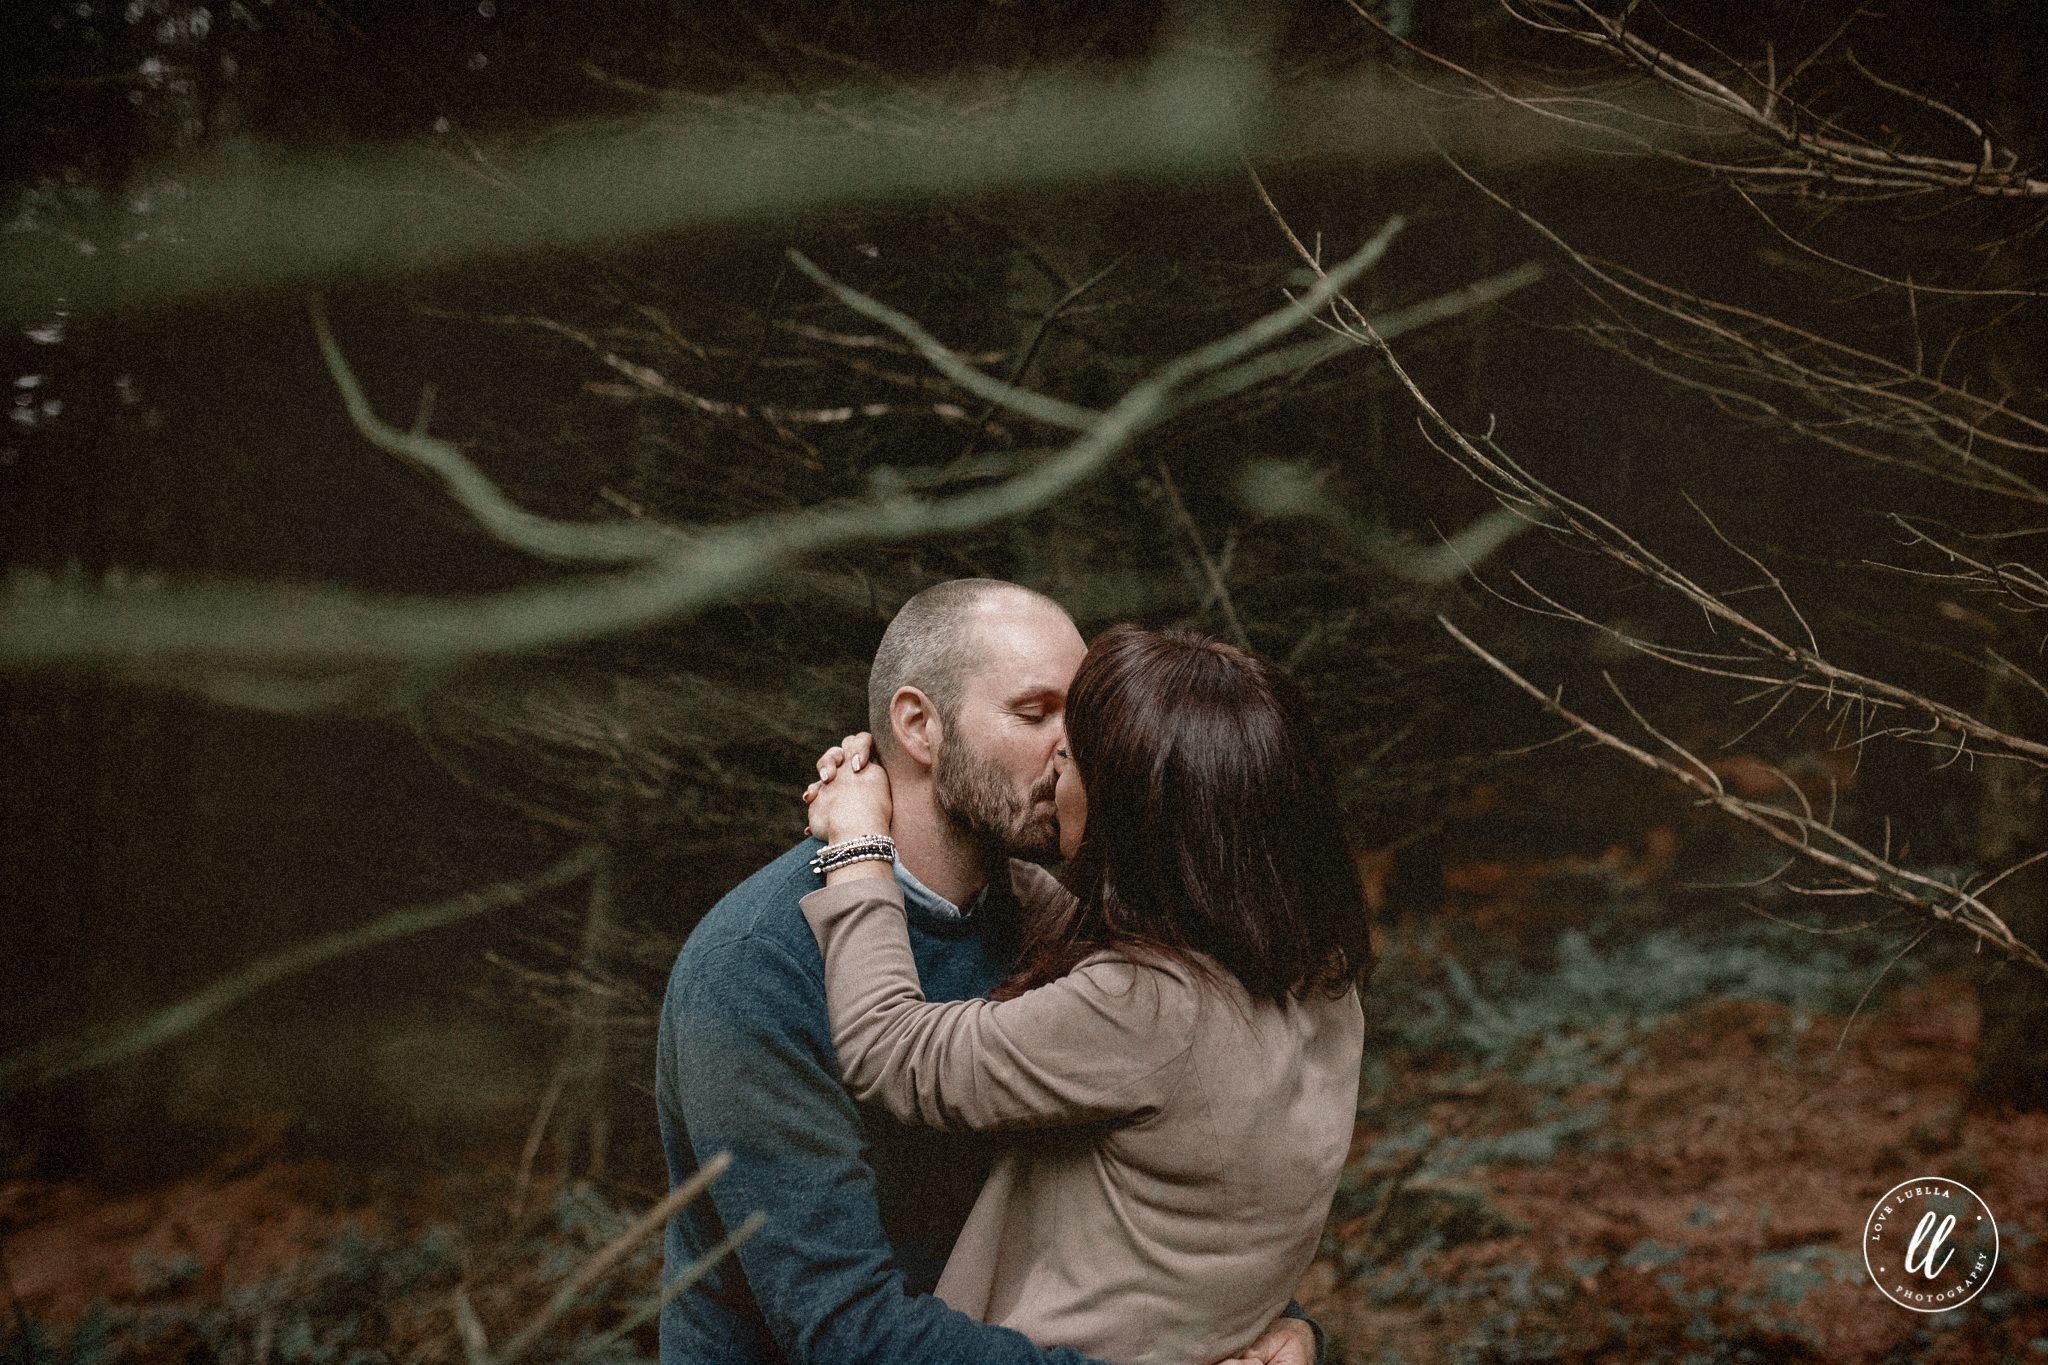 Prestatyn Engagement Photographer-7ase.jpg